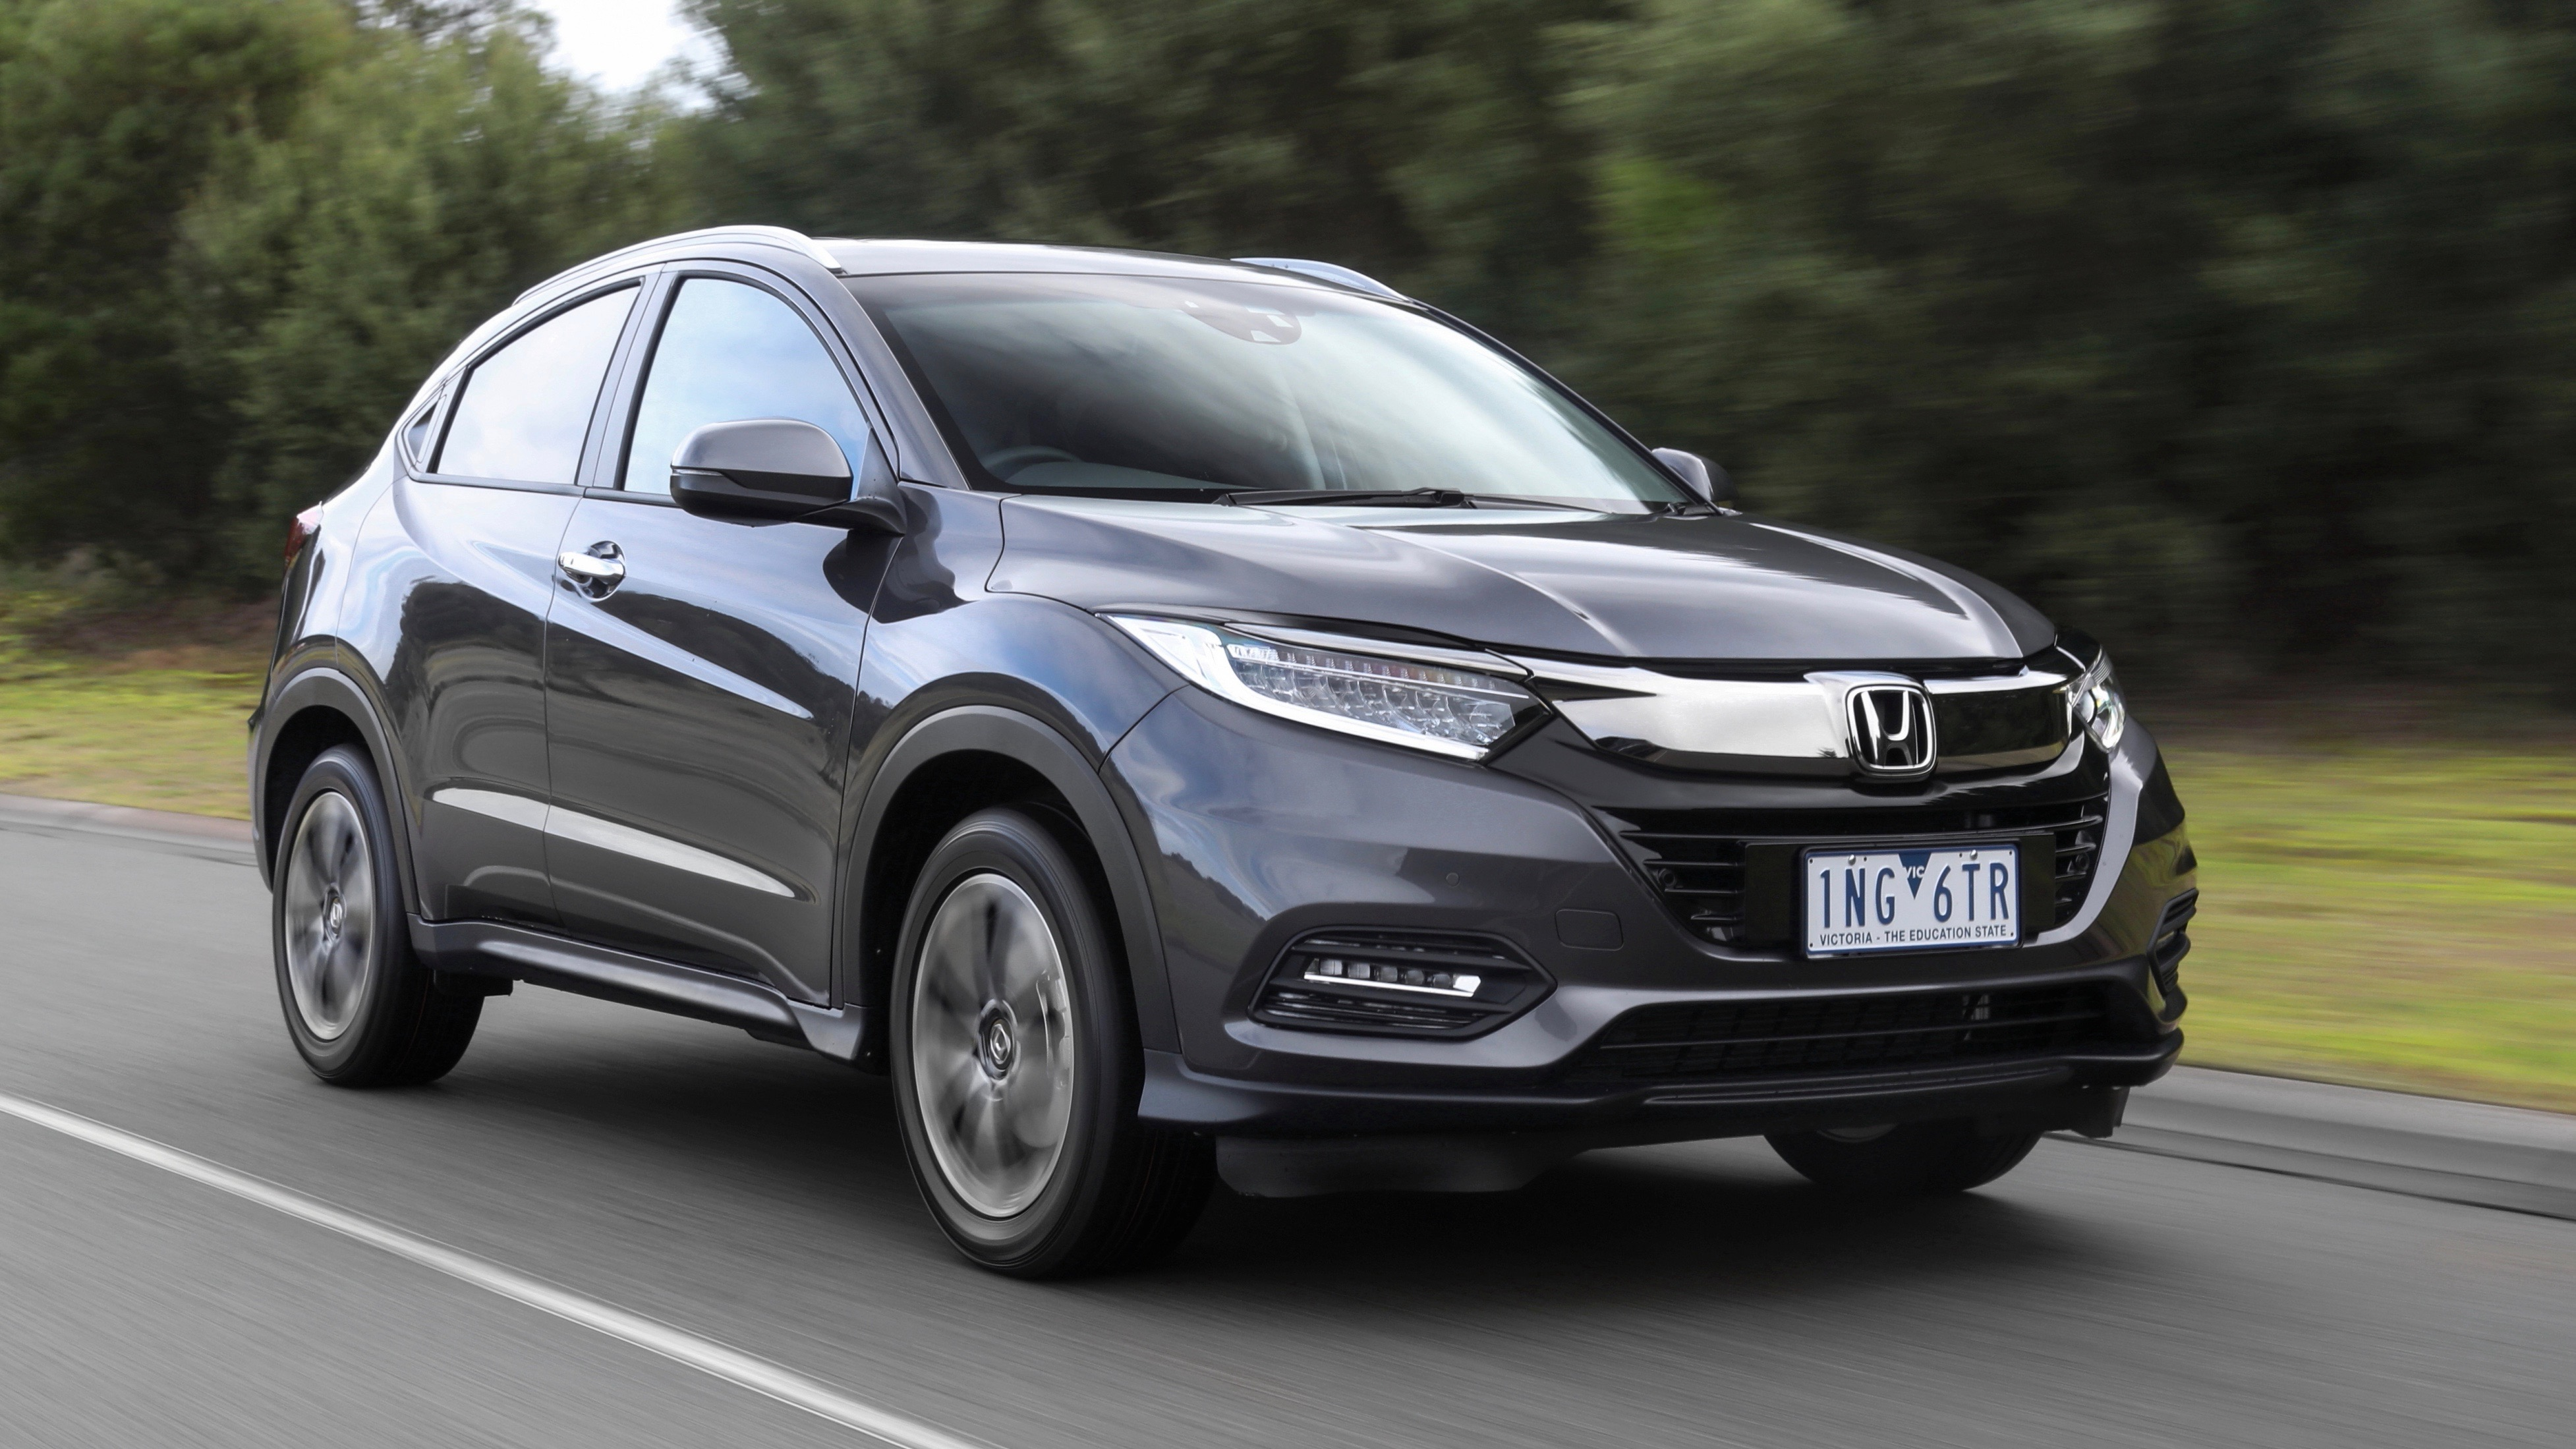 2019 Honda HR-V VTi-LX grey front 3/4 driving